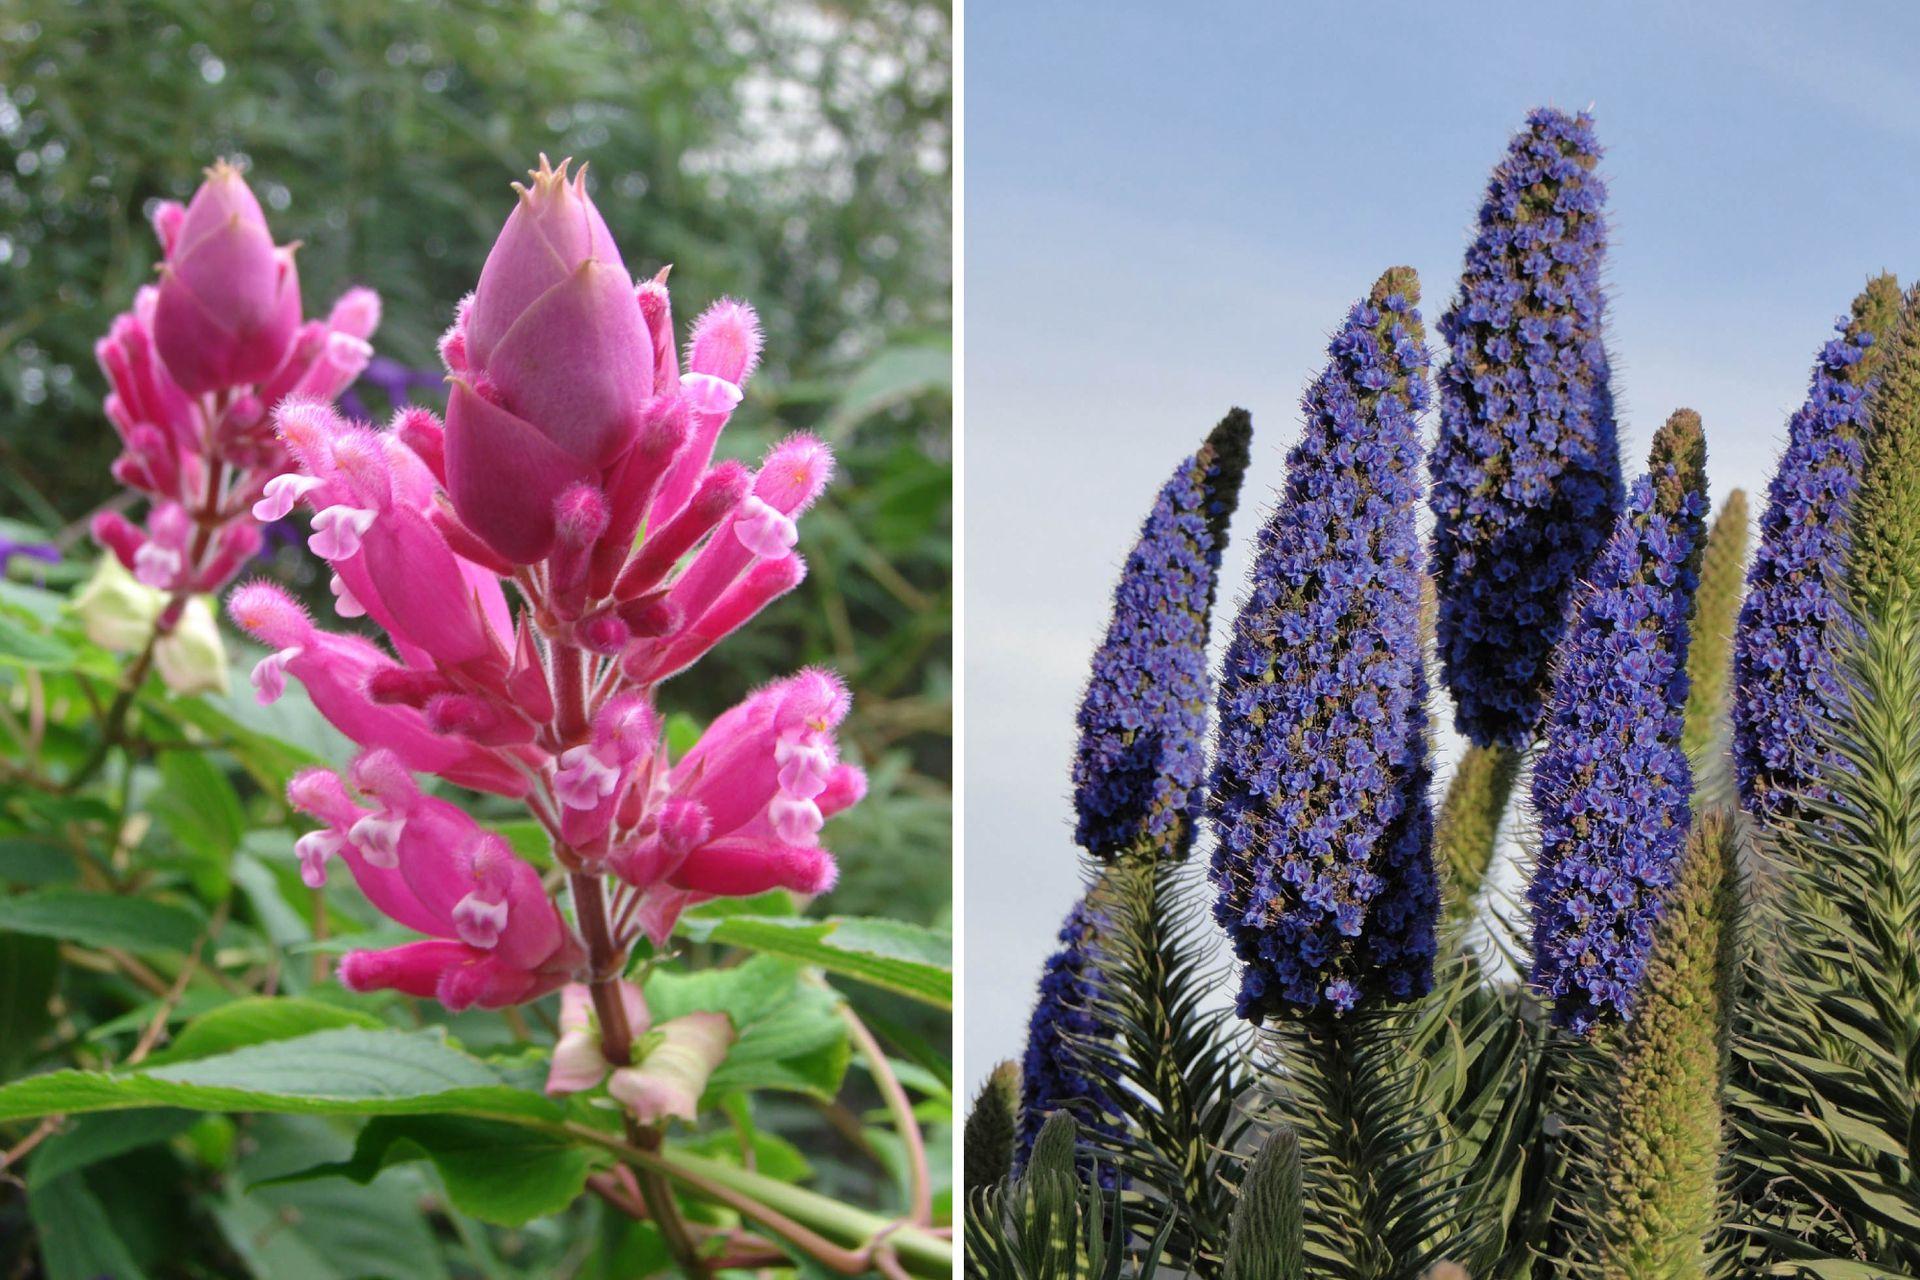 Izq.: Salvia involucrata o coral de invierno. Der.: Echium candicans.